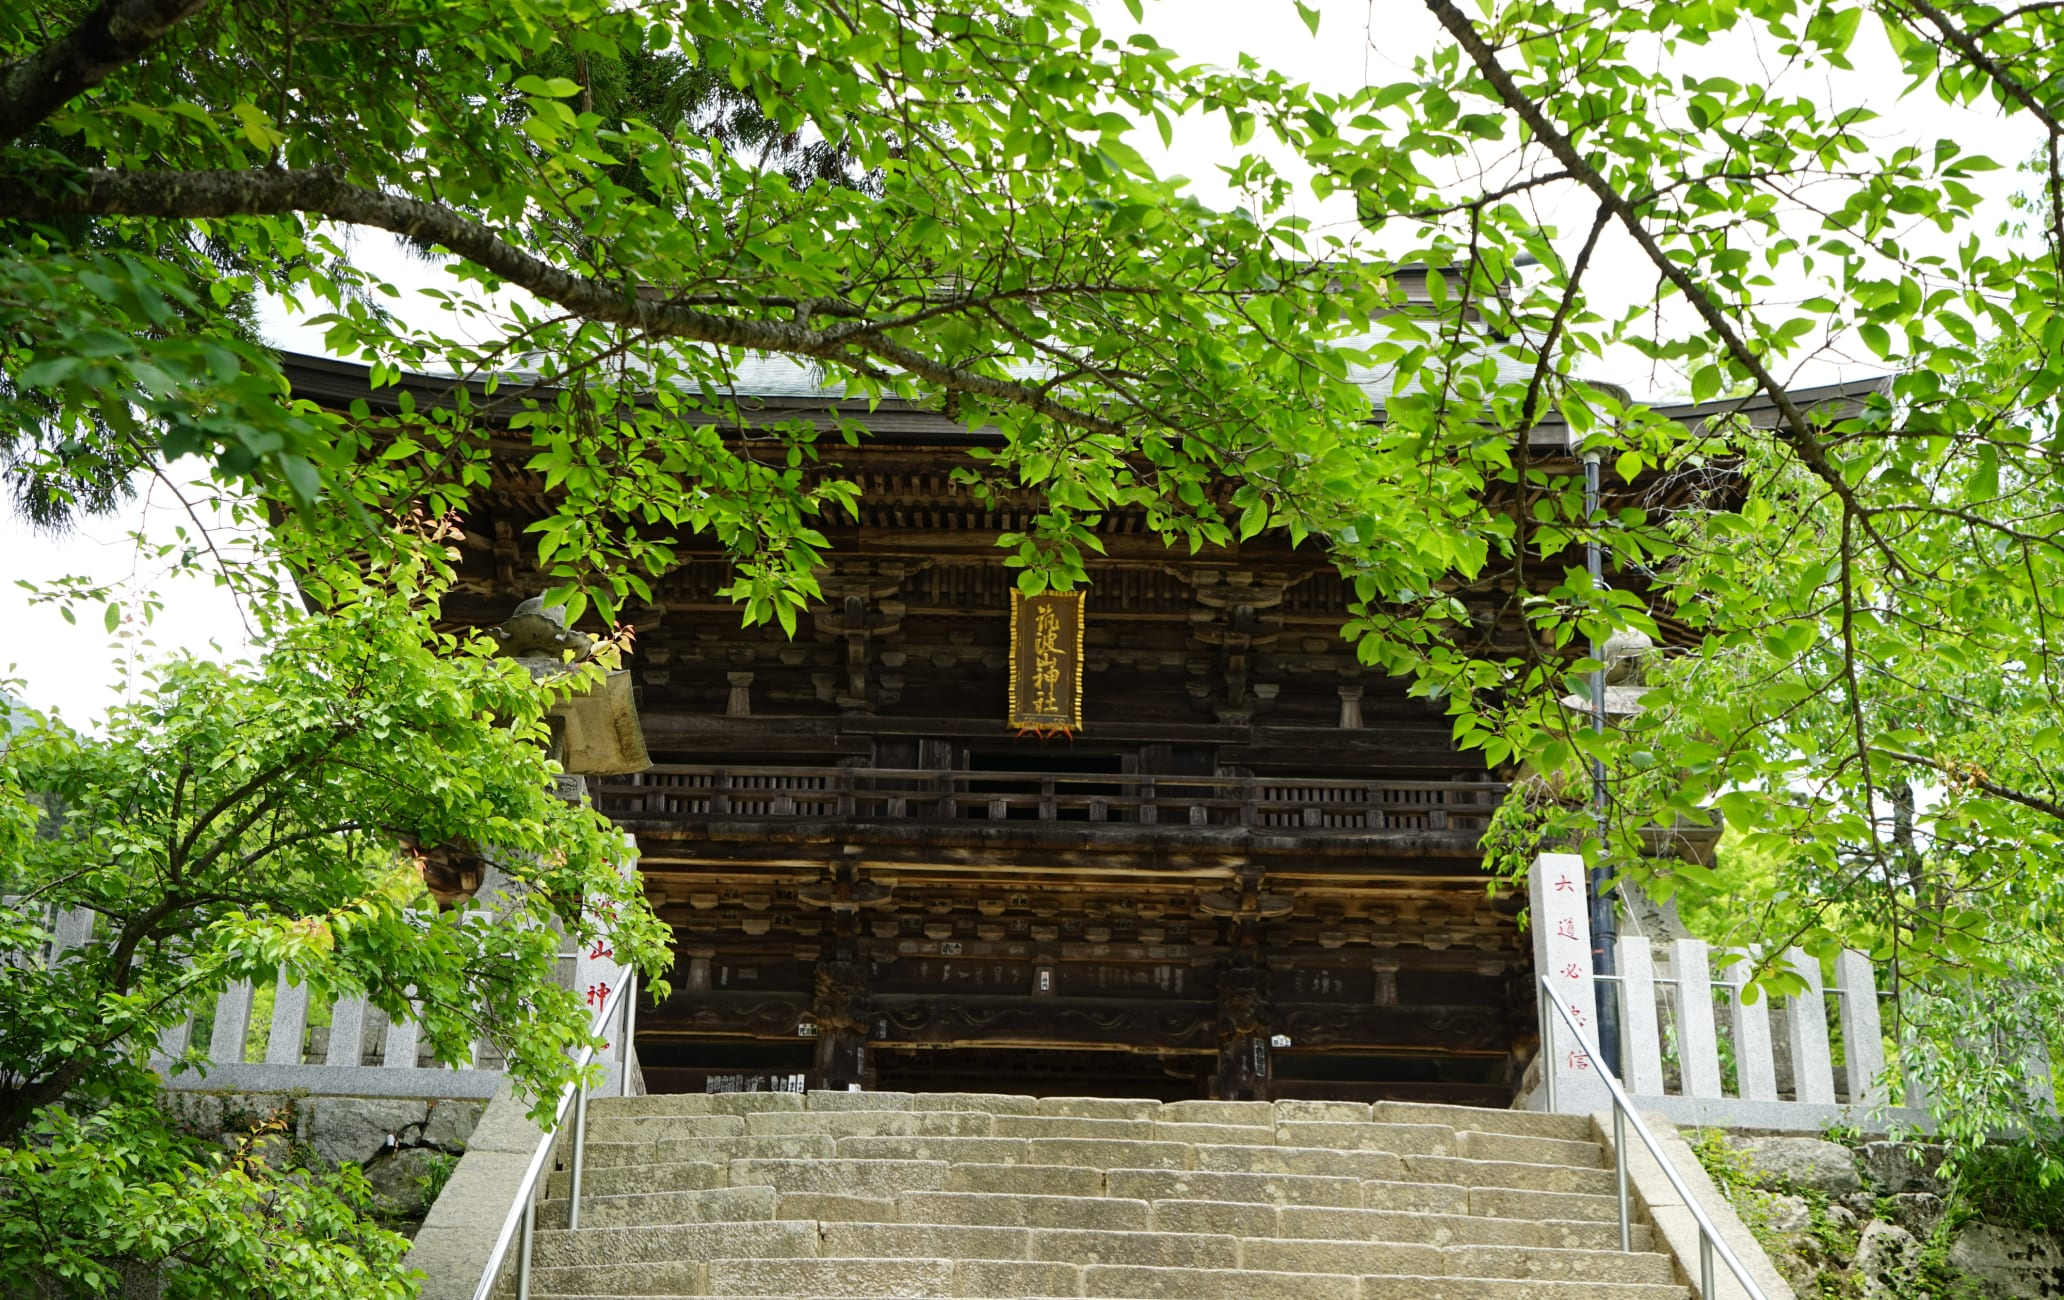 Tsukuba-san Shrine